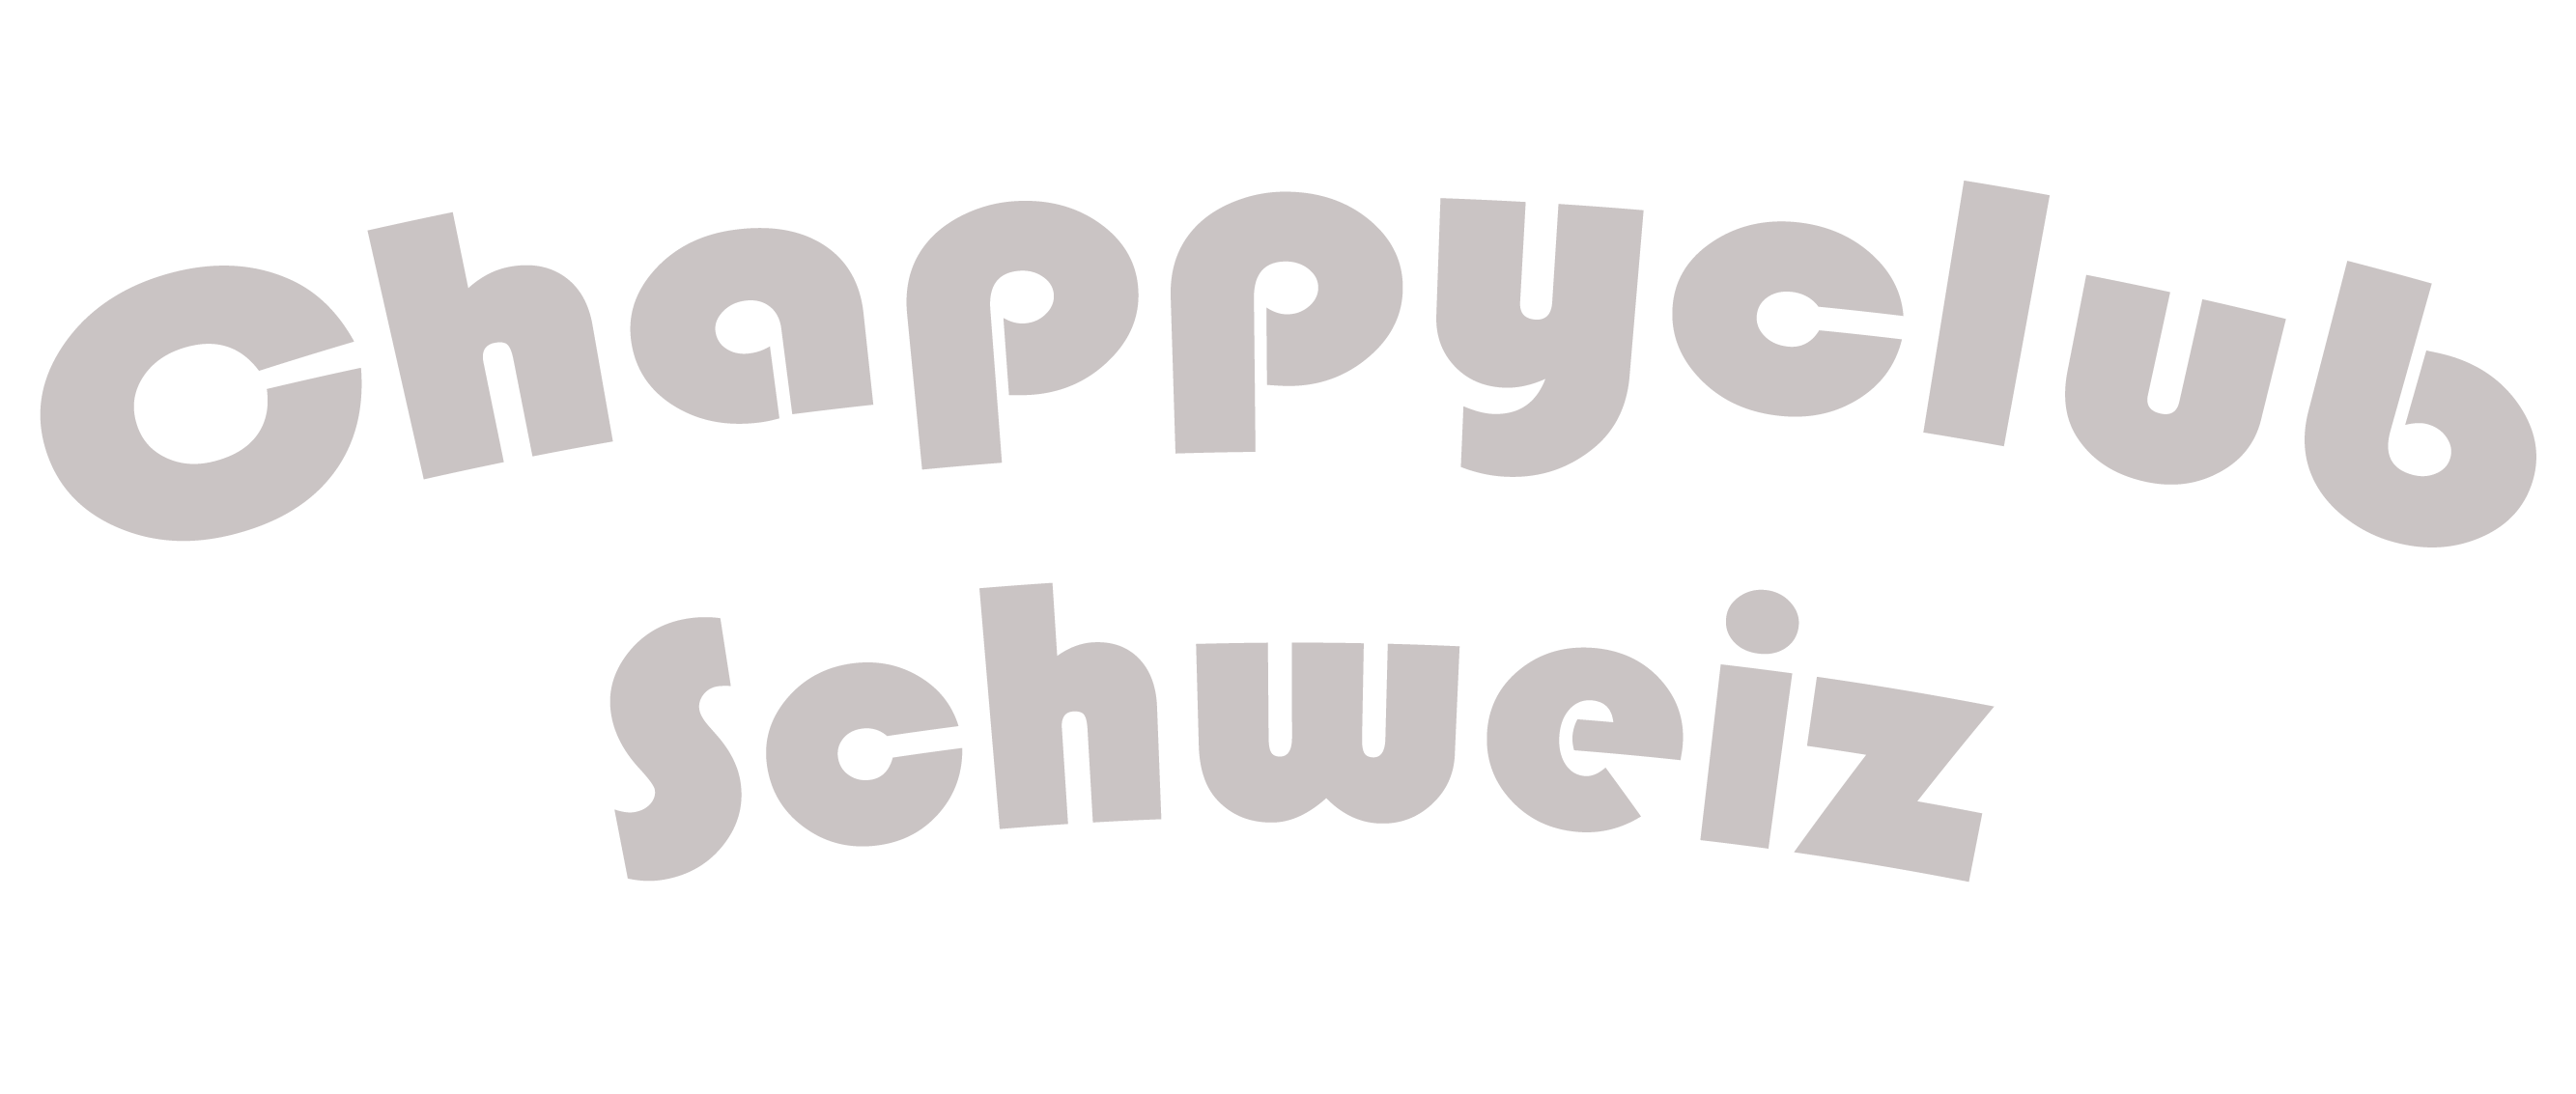 Chappyclub Schweiz